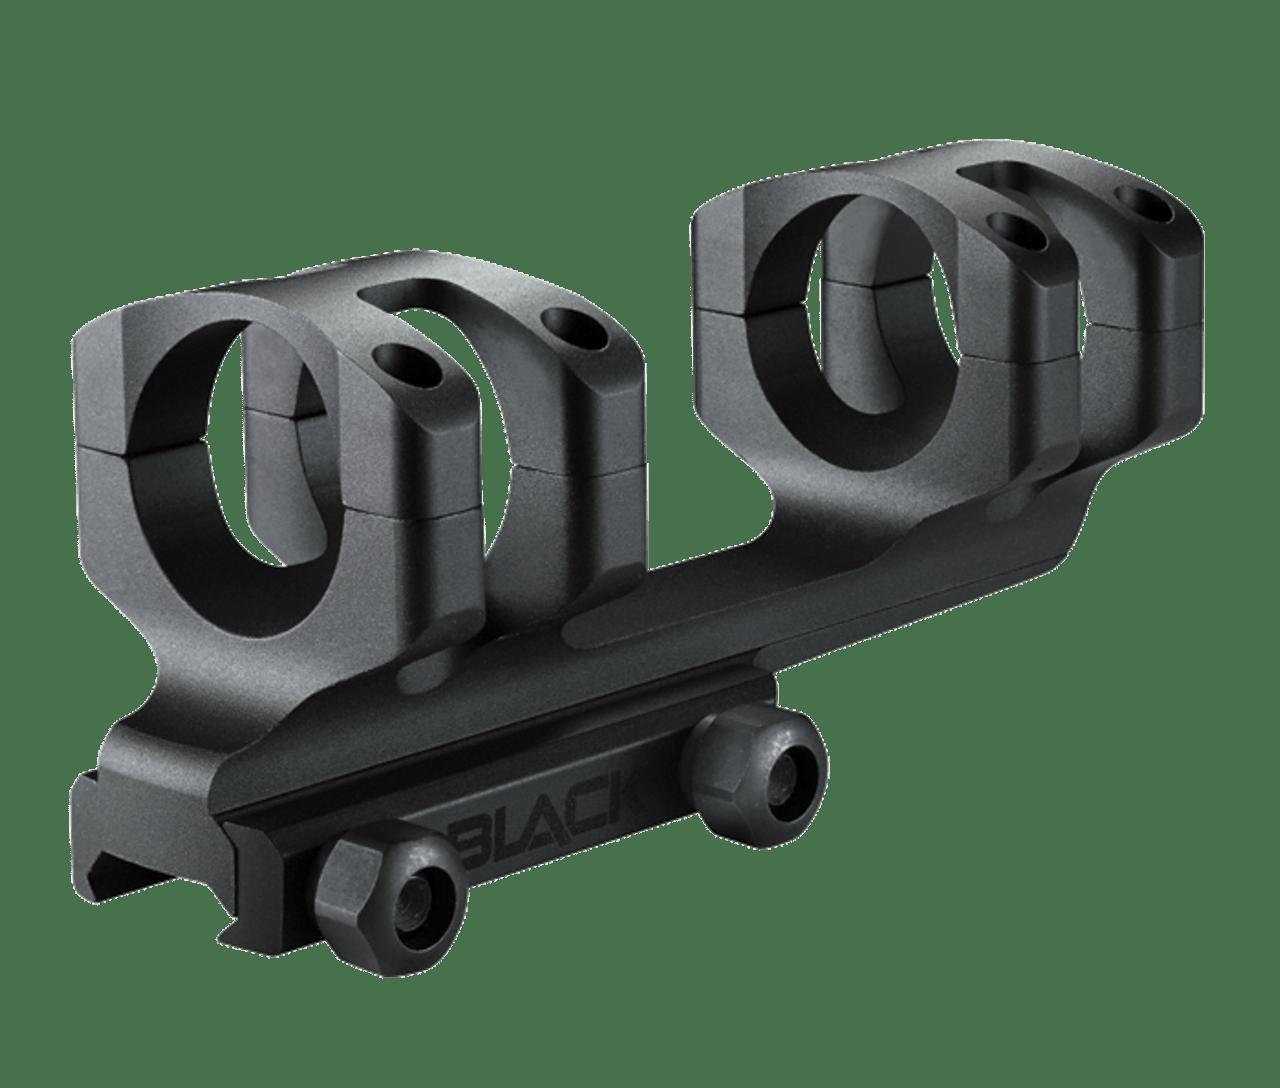 Nikon BLACK Cantilever Mount (20 MOA Slope)